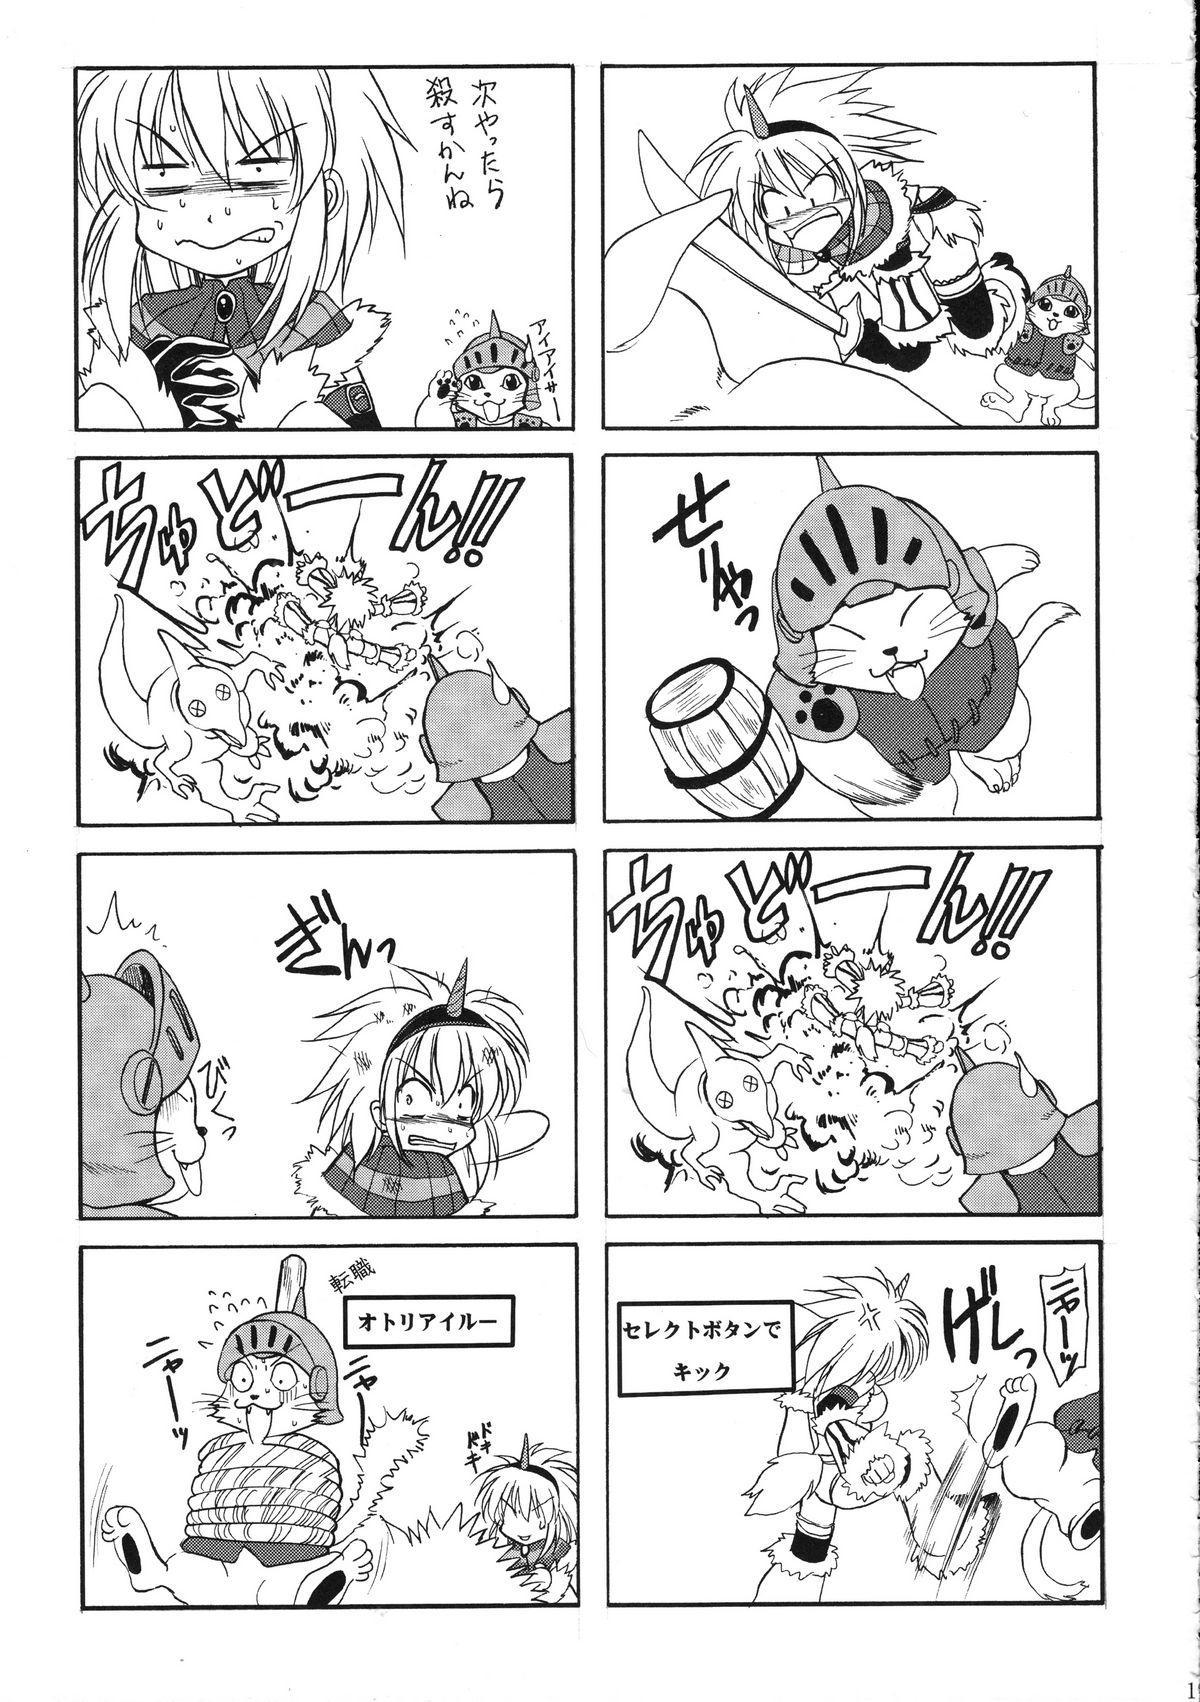 Neko Kick 19